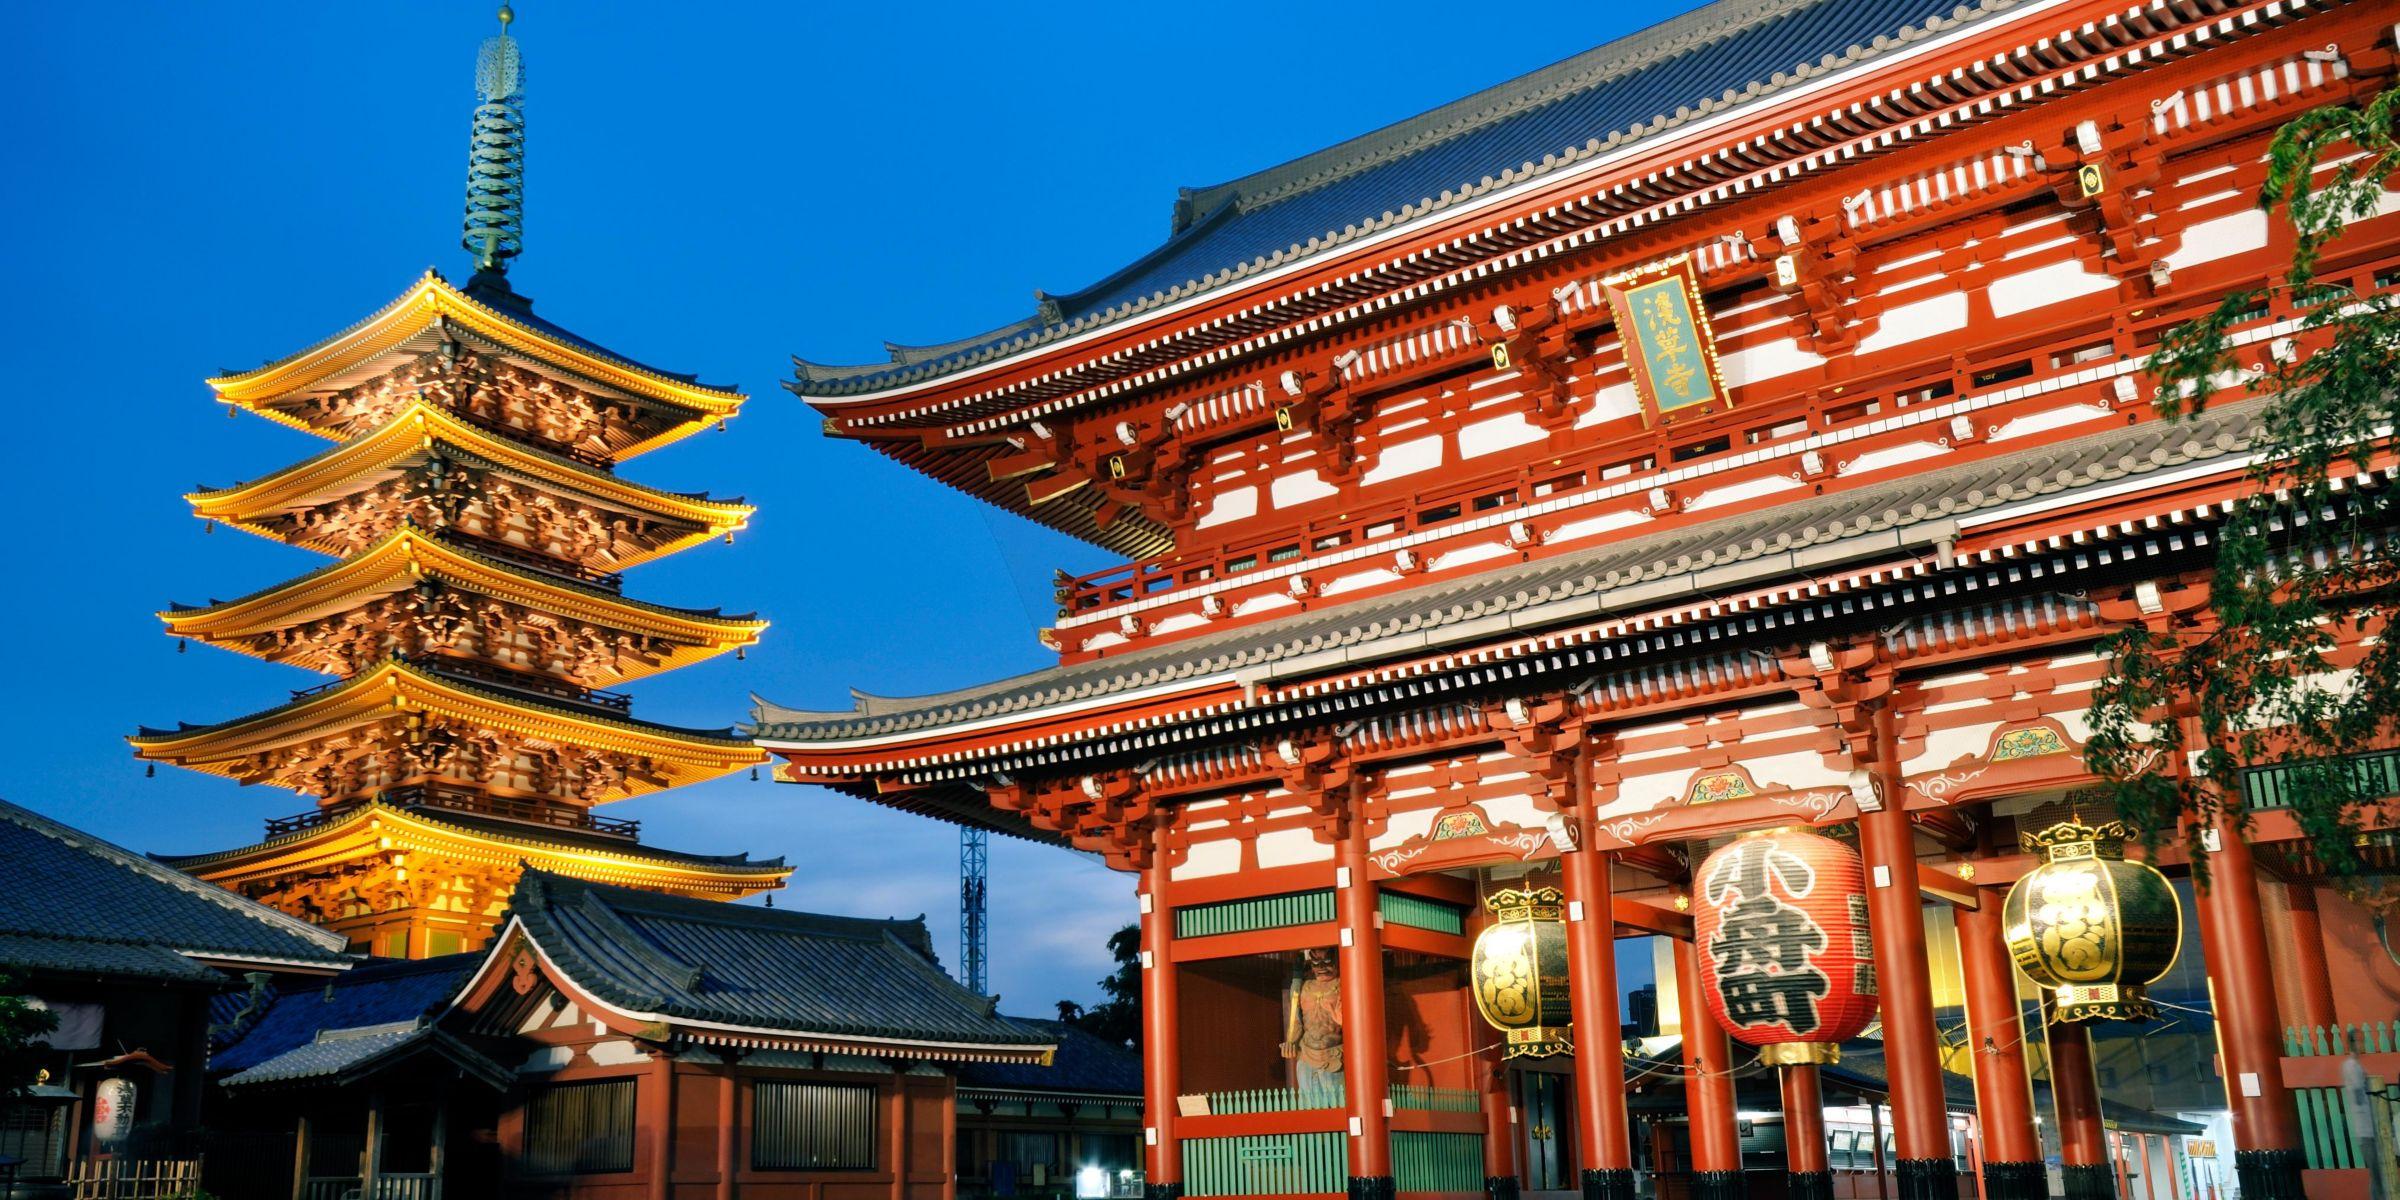 intercontinental ana tokyo tokyo tôkyô tokyo インター